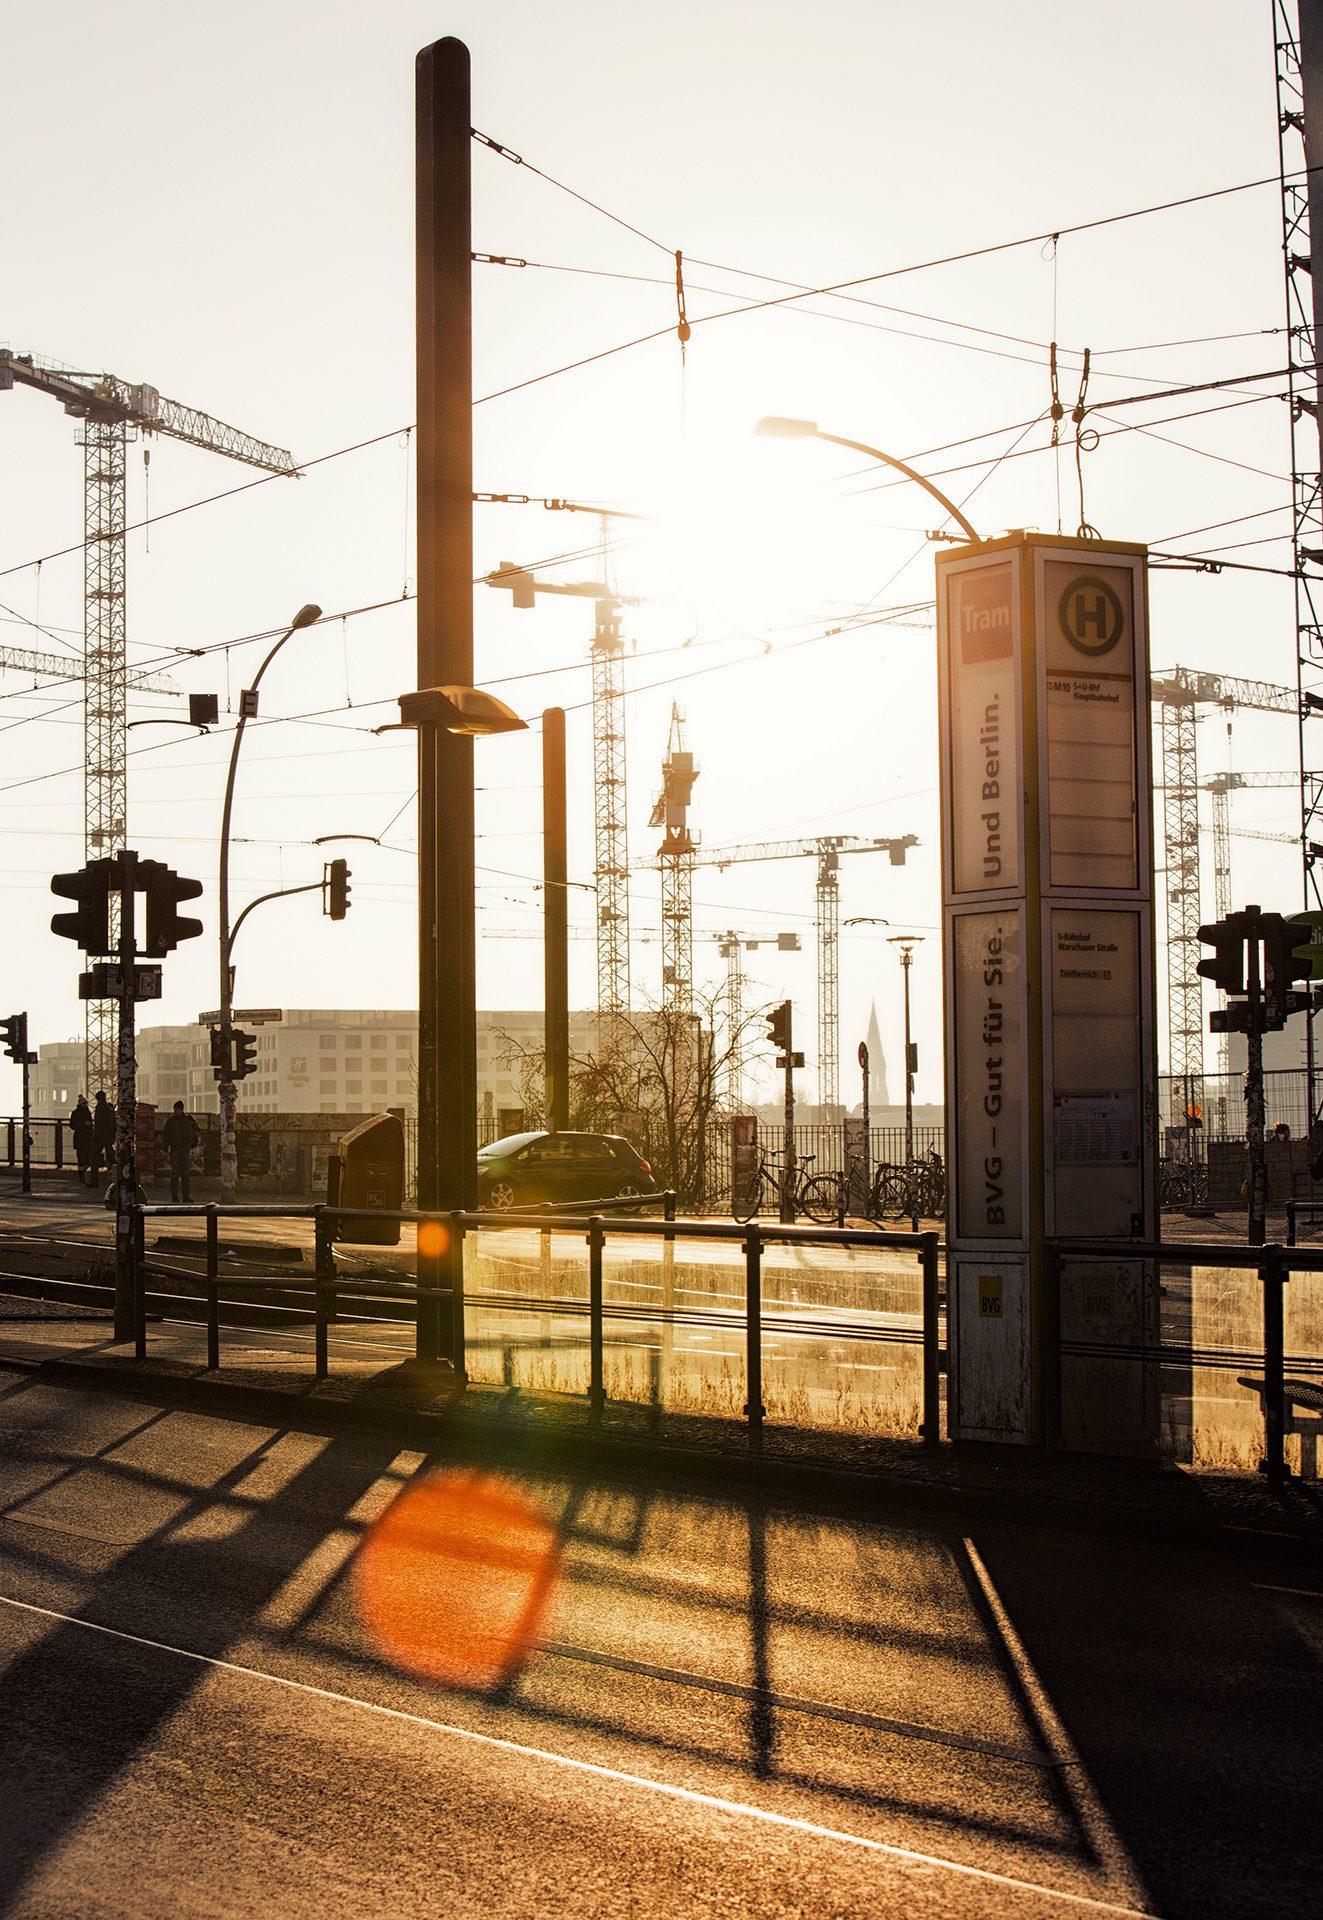 Berlin, Germany, urban, city, sunset, shadows